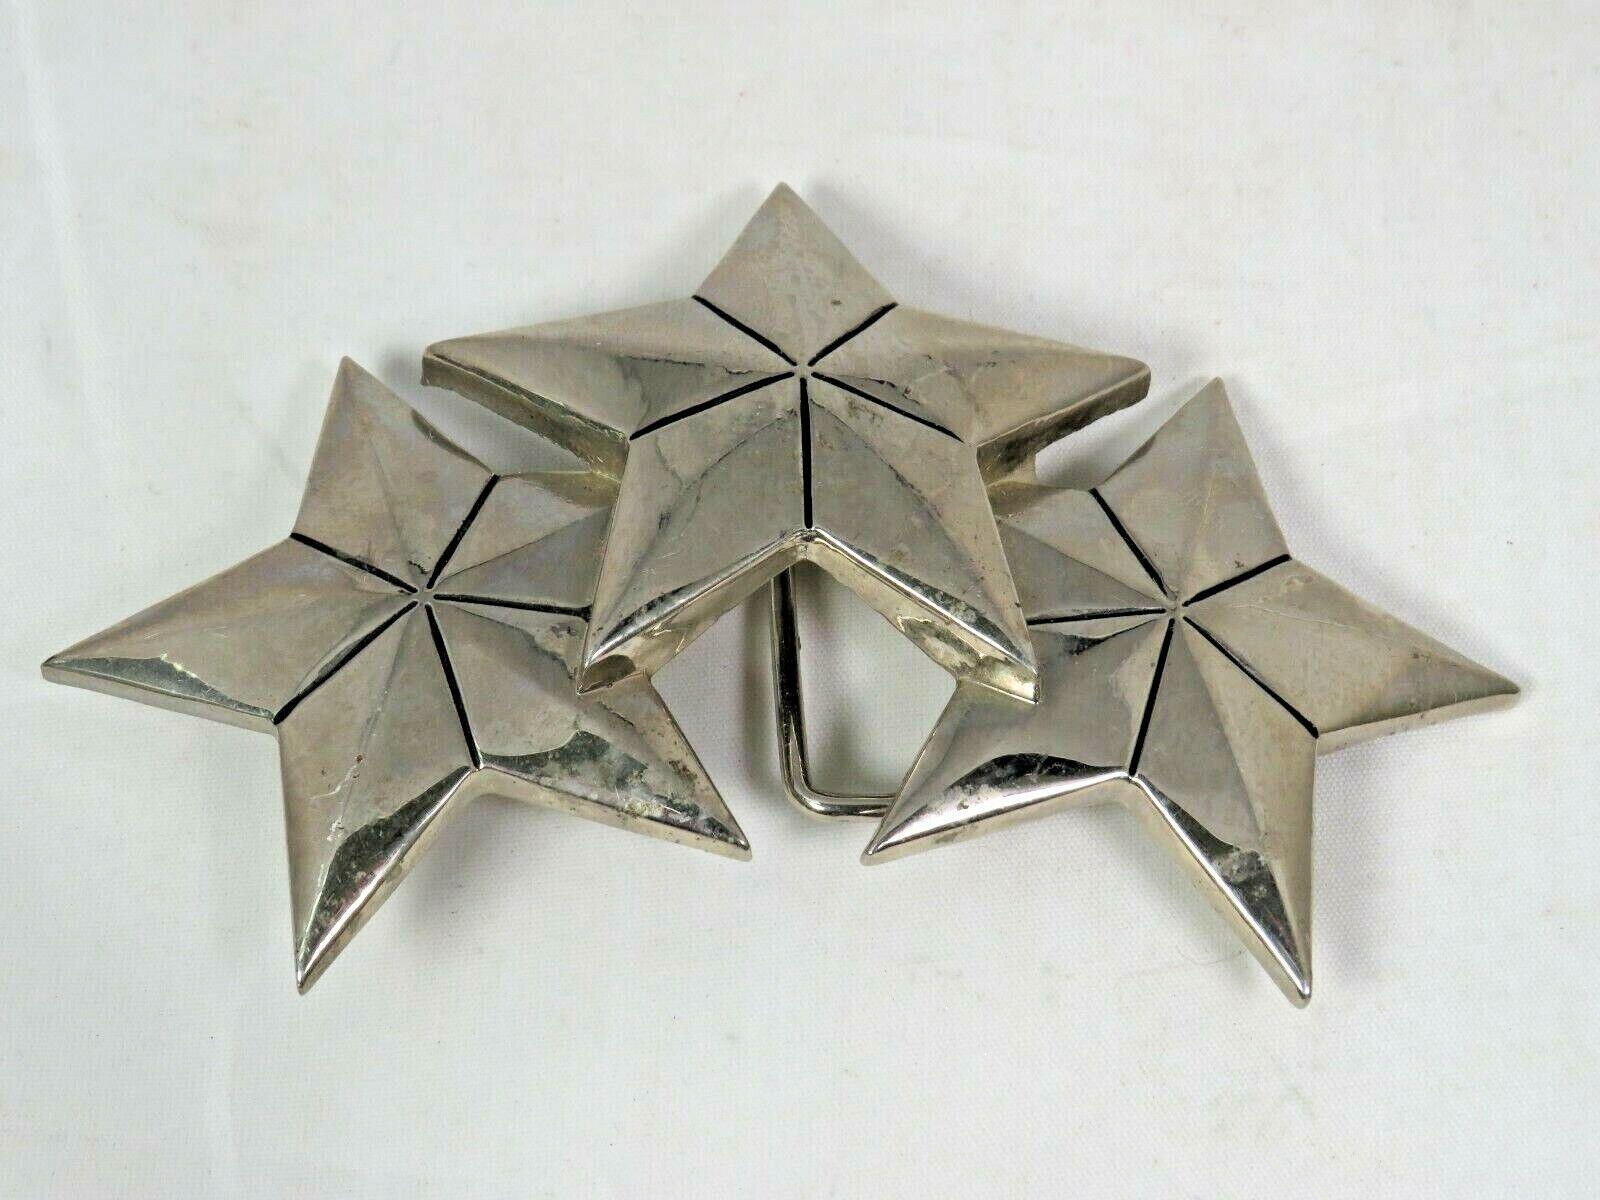 Tristar Silver Tone 3 Stars Belt Buckle By Rock Rebel Cowboy - A9